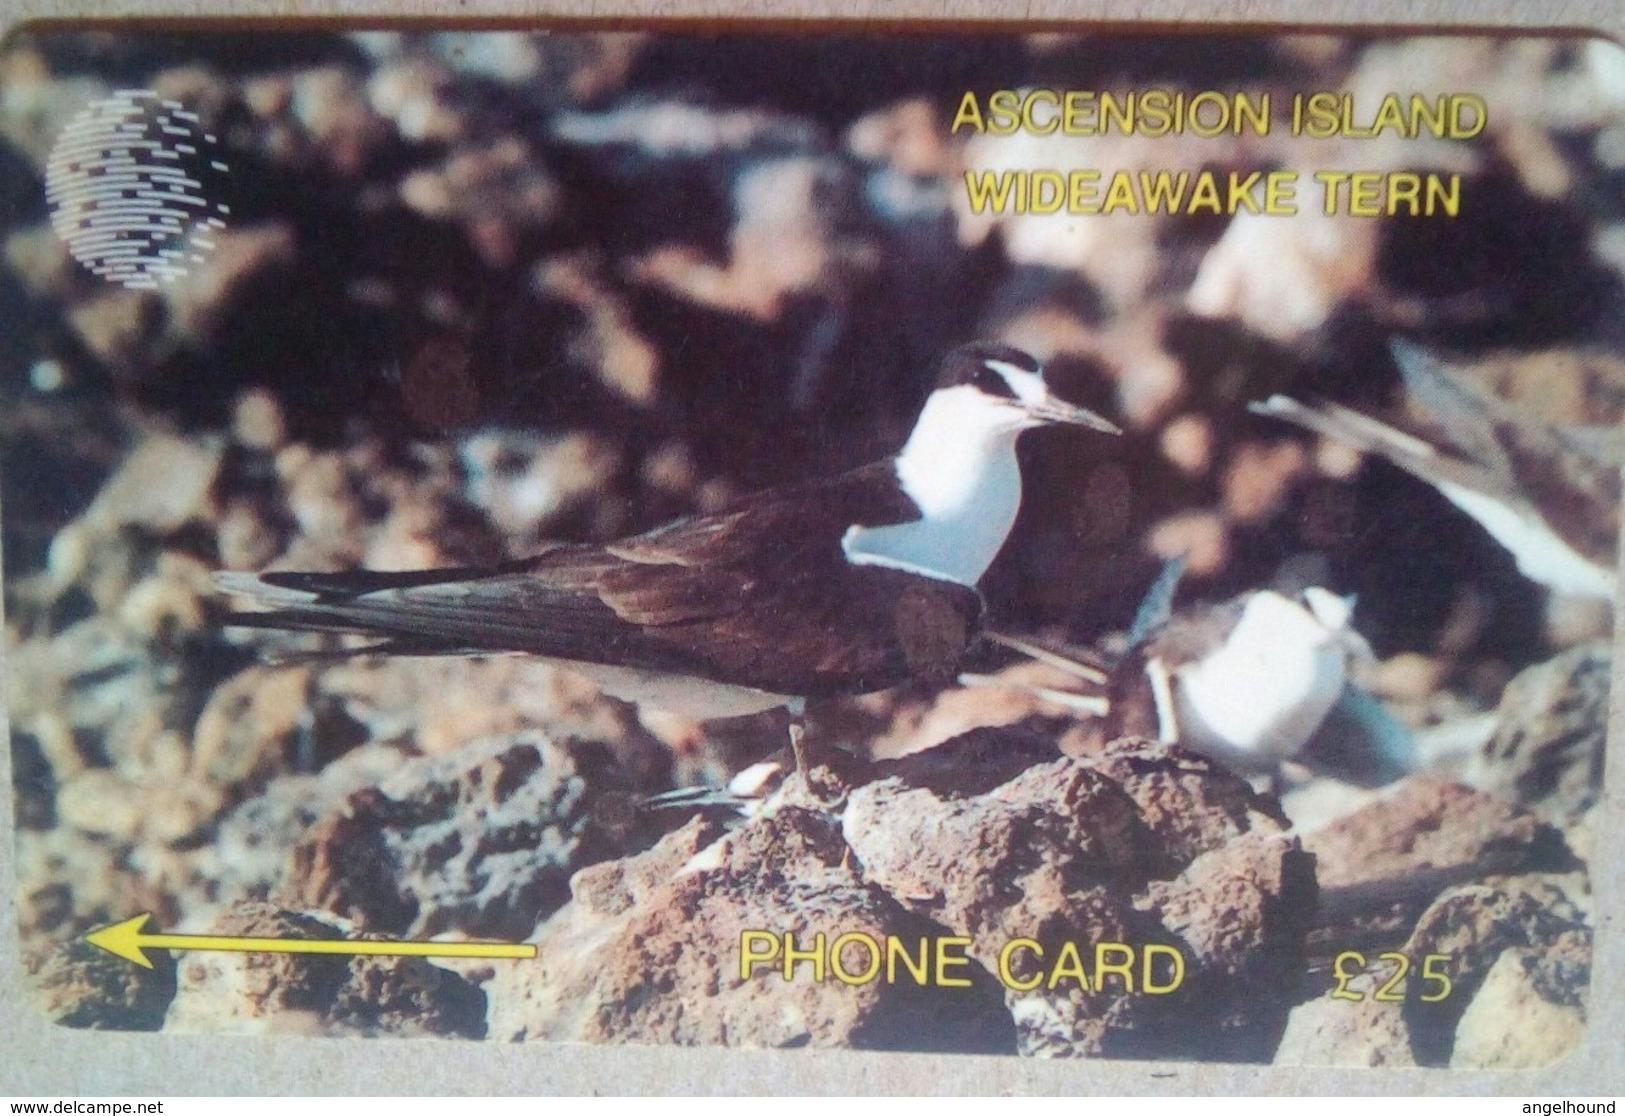 3CASD Wide Awake Tern 25 Pounds - Ascension (Insel)